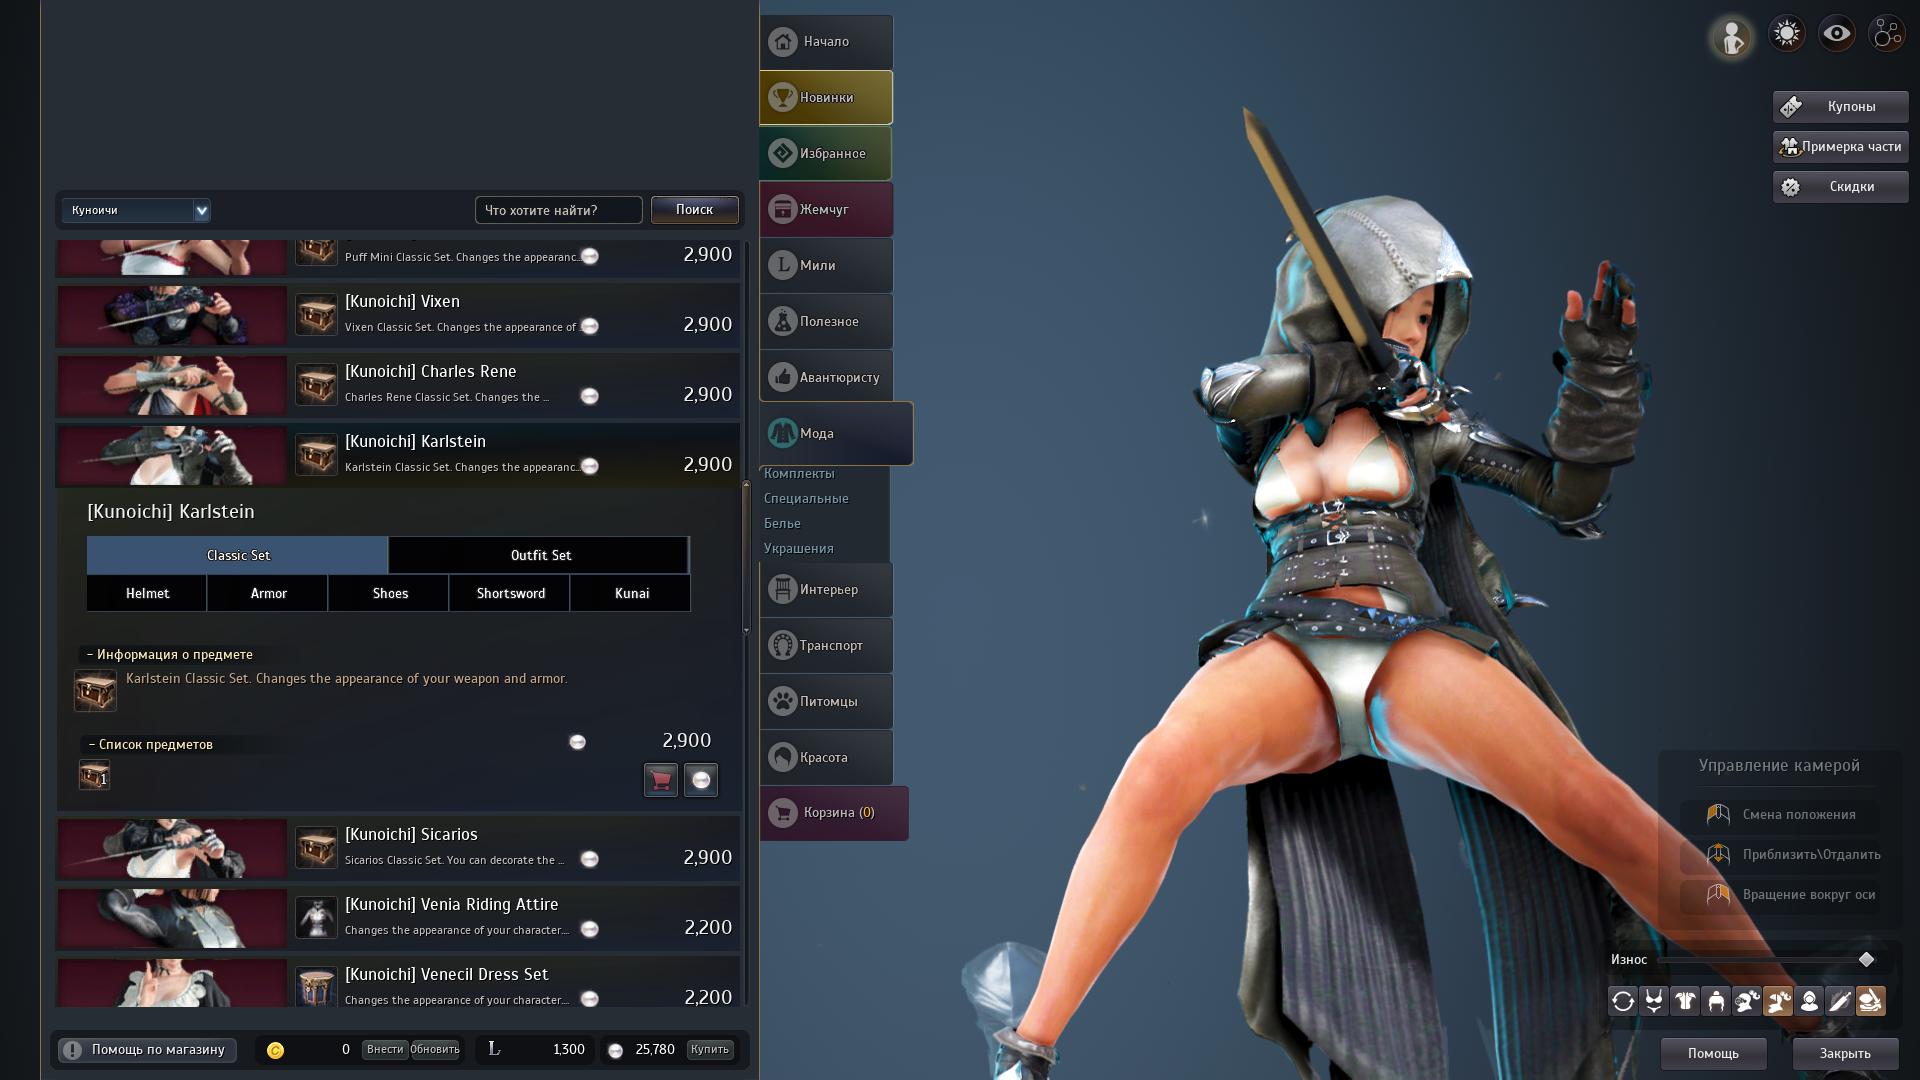 Desktop Screenshot 2020.03.25 - 12.13.30.50.png